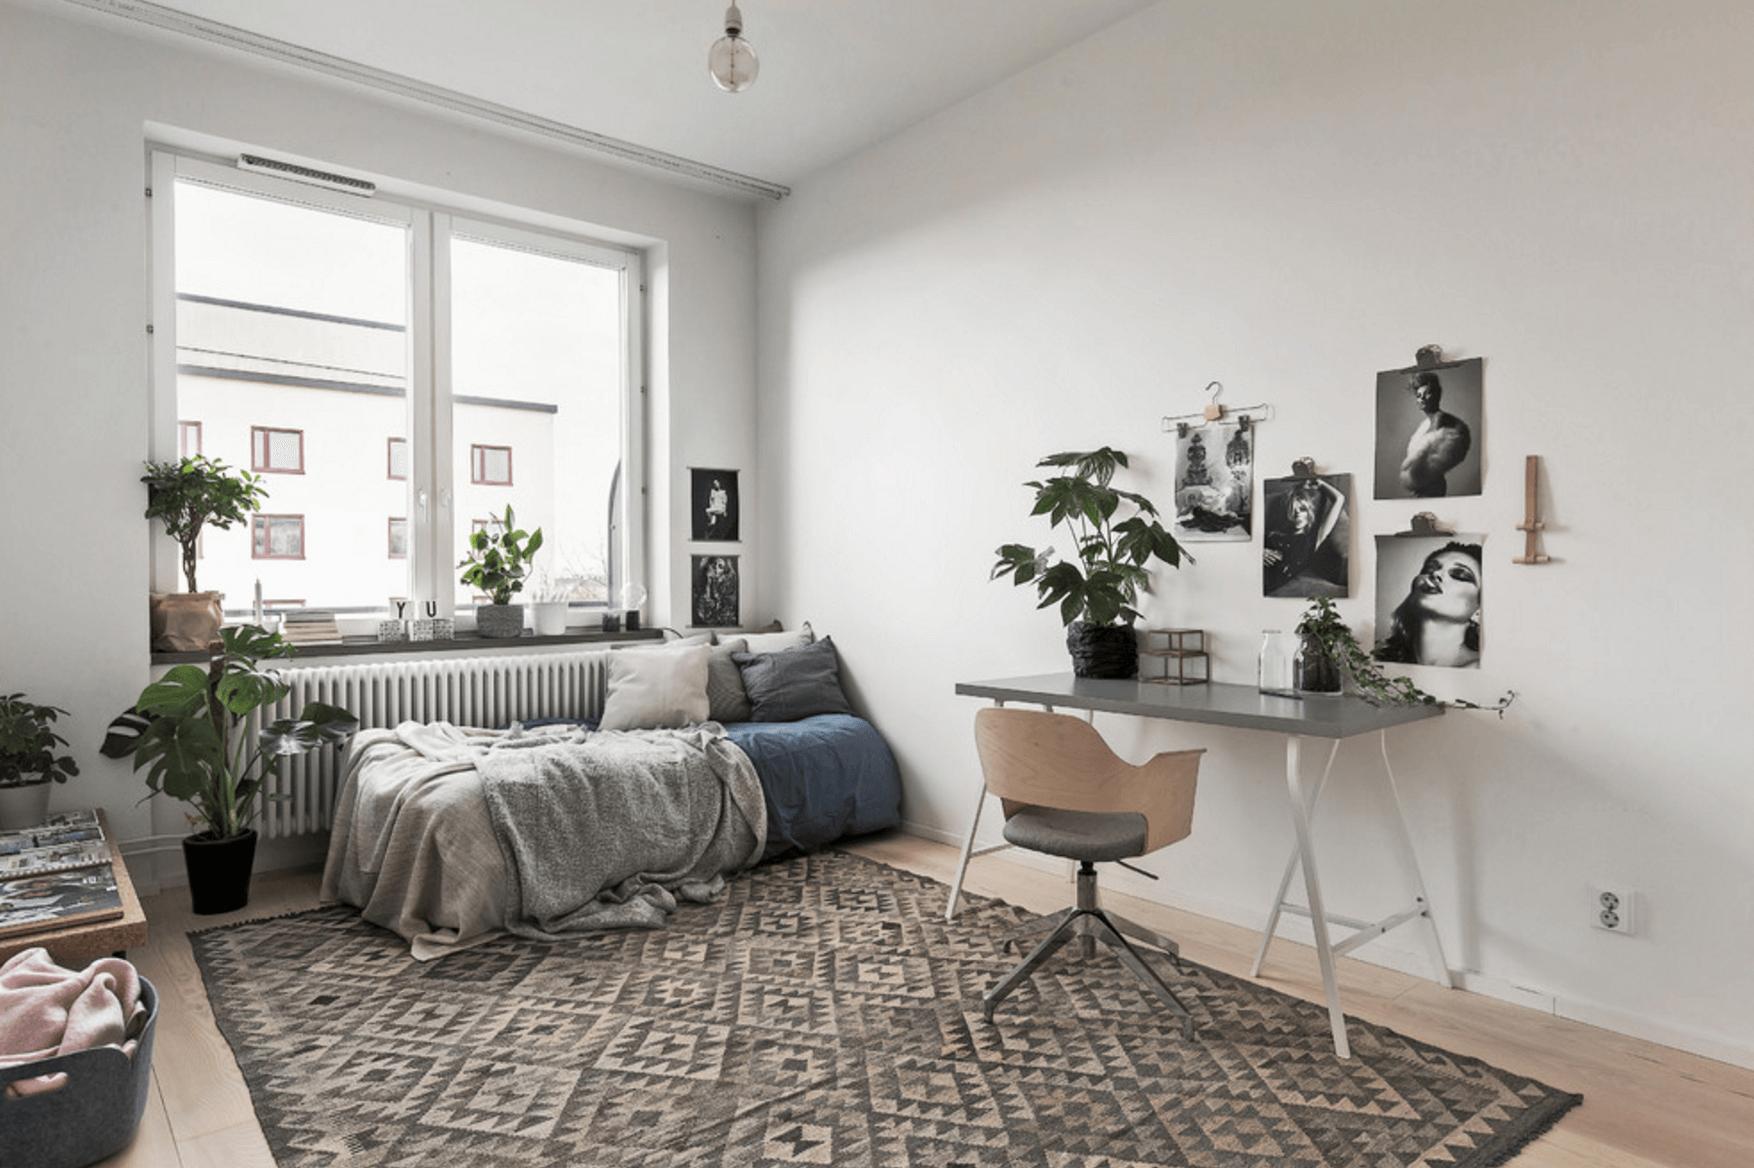 Stunningly Scandinavian Interior Designs Modern Scandinavian Interior Scandinavian Interior Design Interior Design